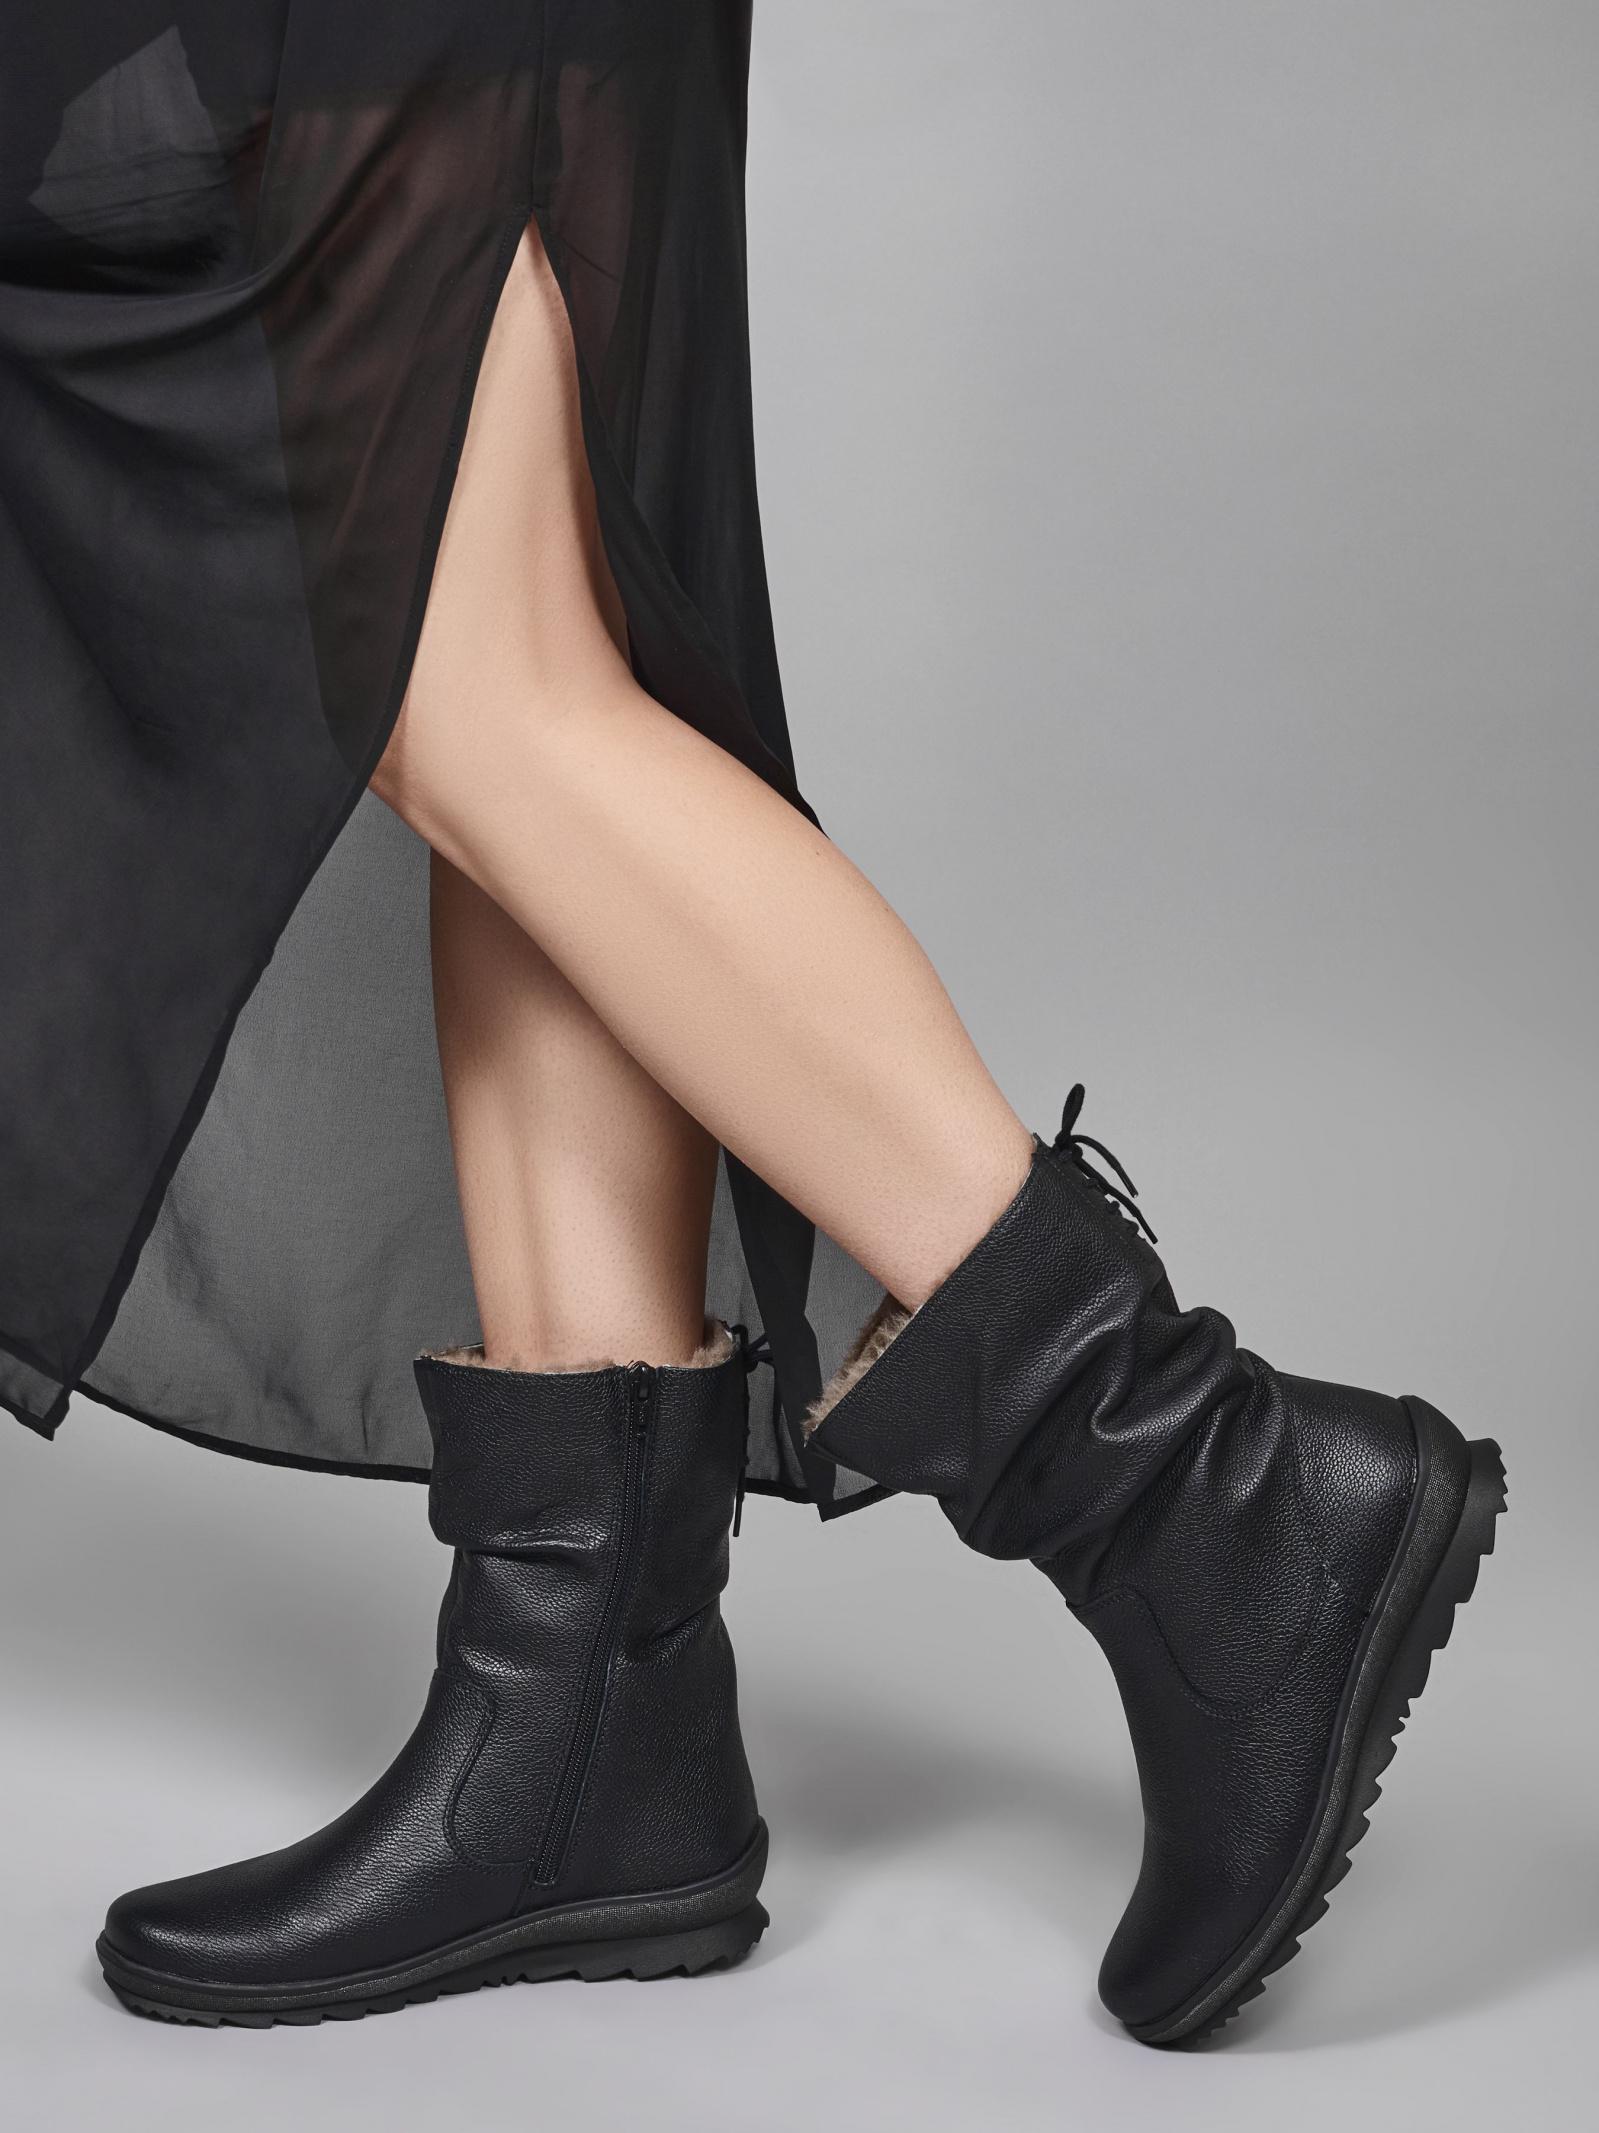 Сапоги для женщин Remonte RD62 размеры обуви, 2017